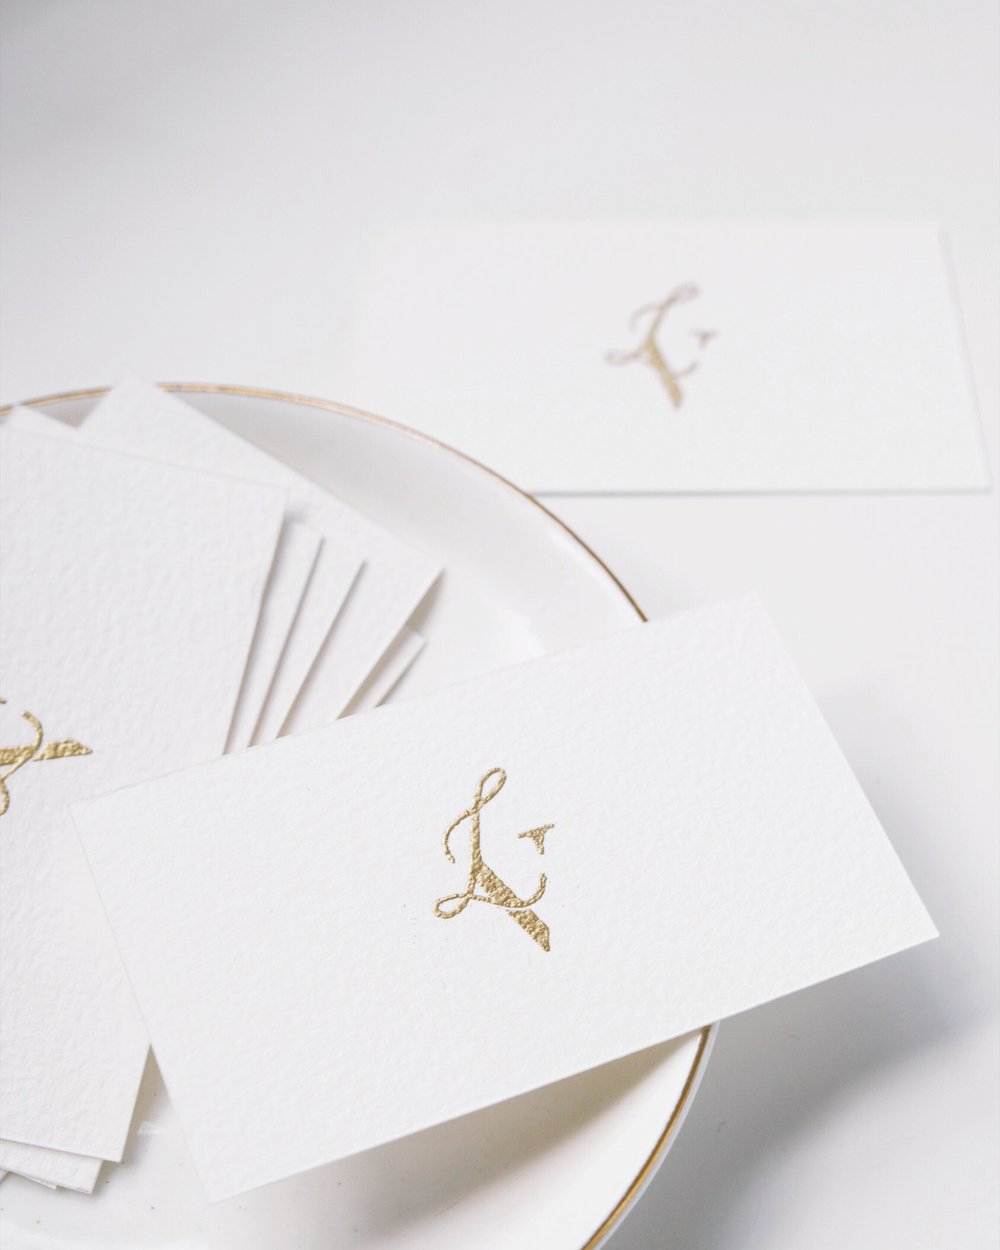 laura-vidal-business-card-heat-embossing-stamp.jpg